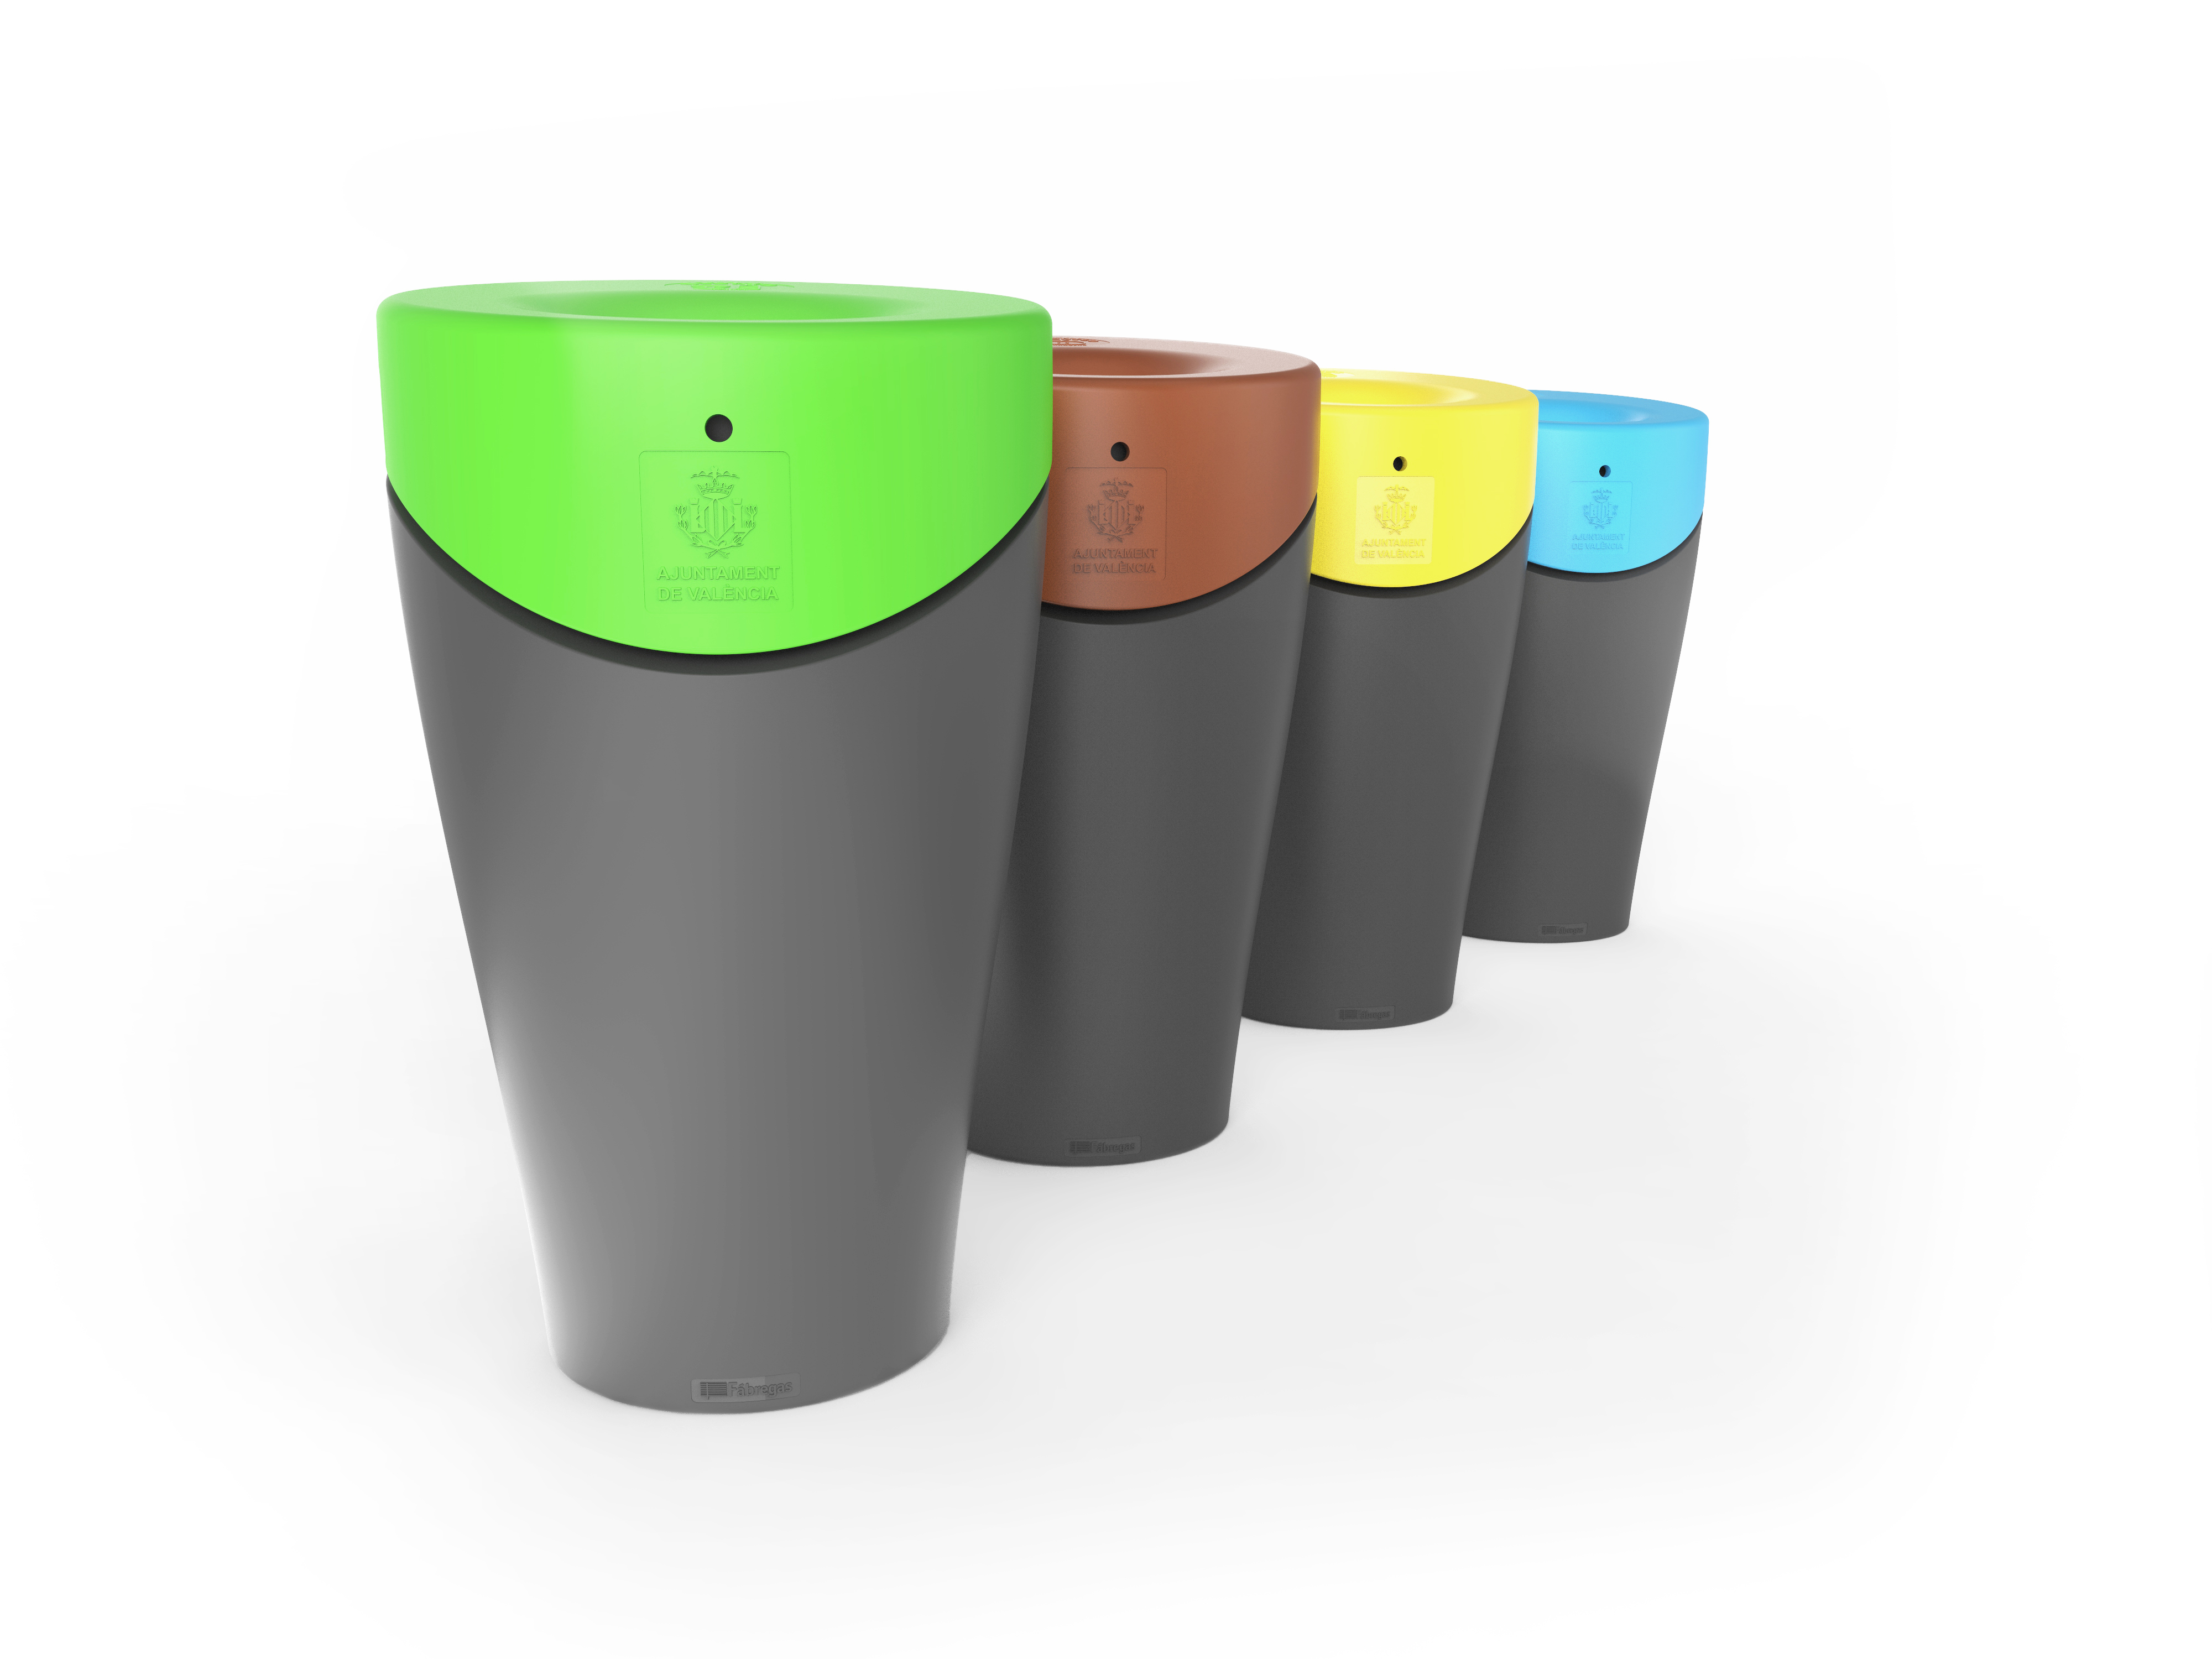 Afvalbak Alvium Urban in 4 kleuren